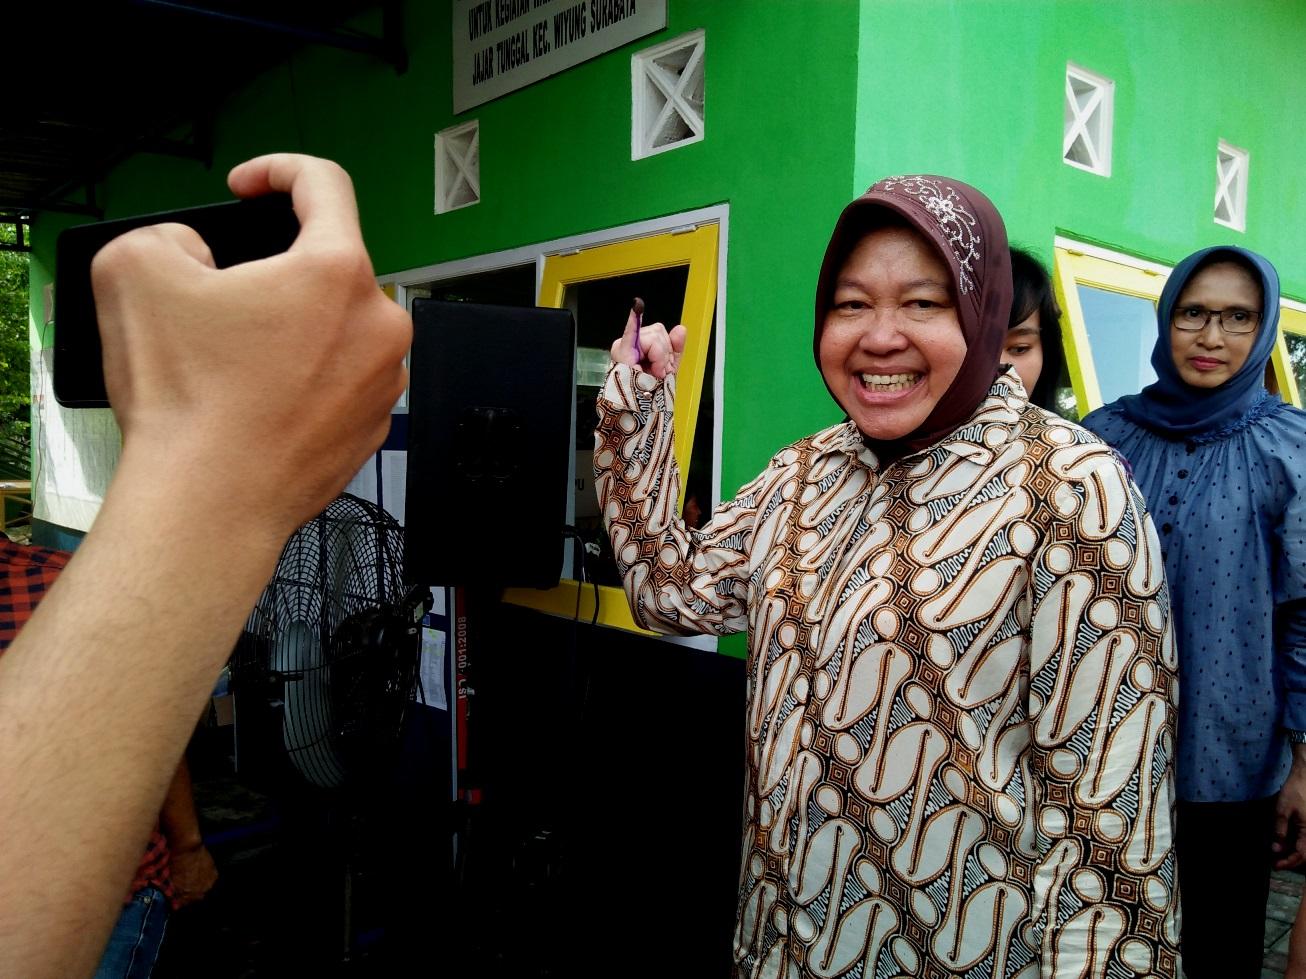 Jokowi Unggul Suara di TPS Risma Mencoblos